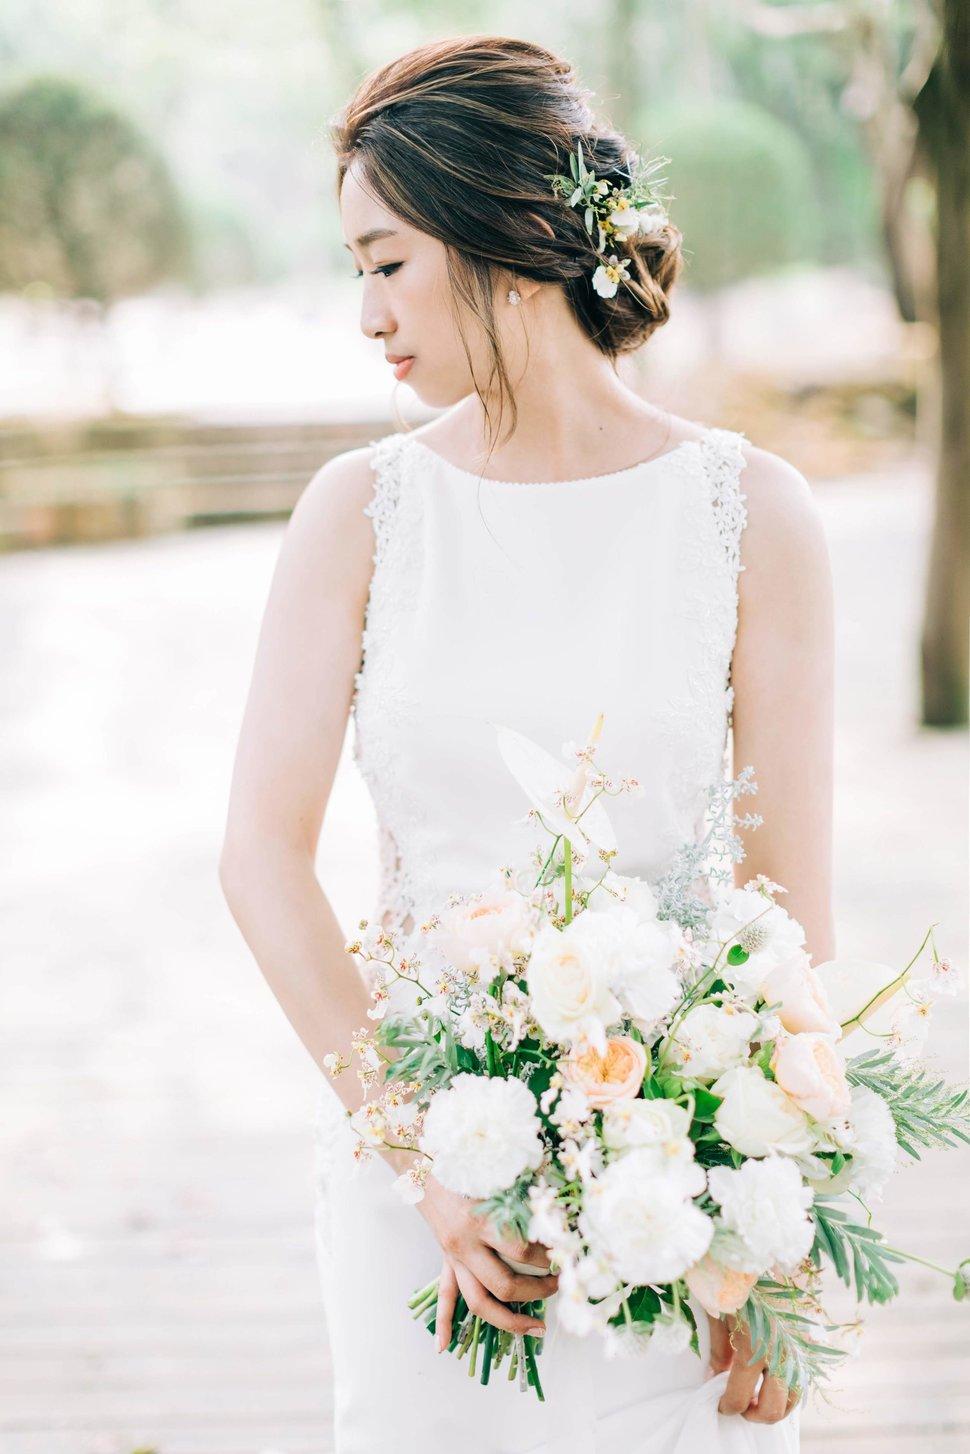 AG3_6988A - Cradle Wedding搖籃手工婚紗《結婚吧》